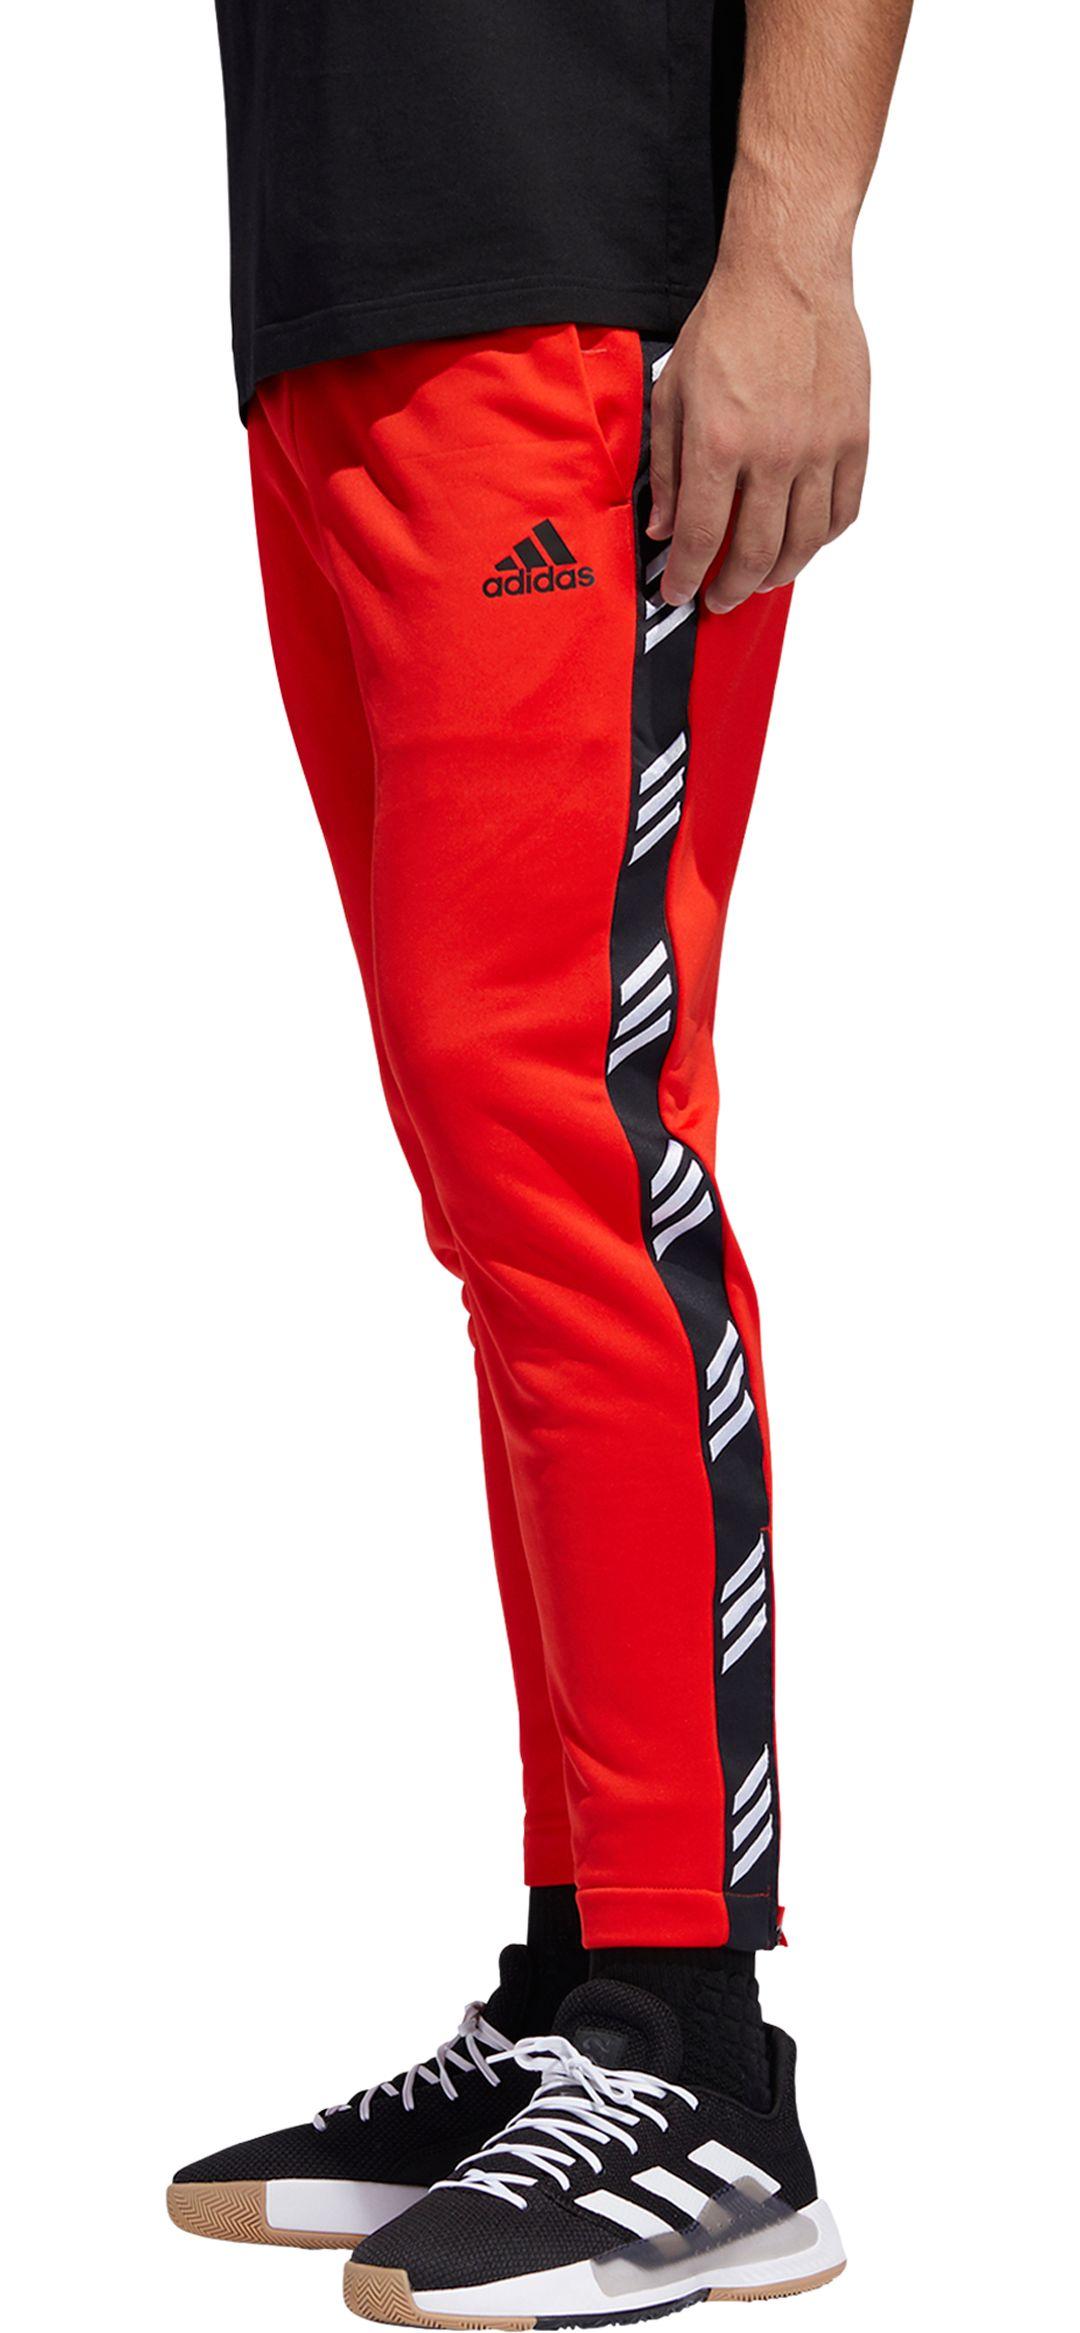 adidas Men's Pro Madness Basketball Track Pants